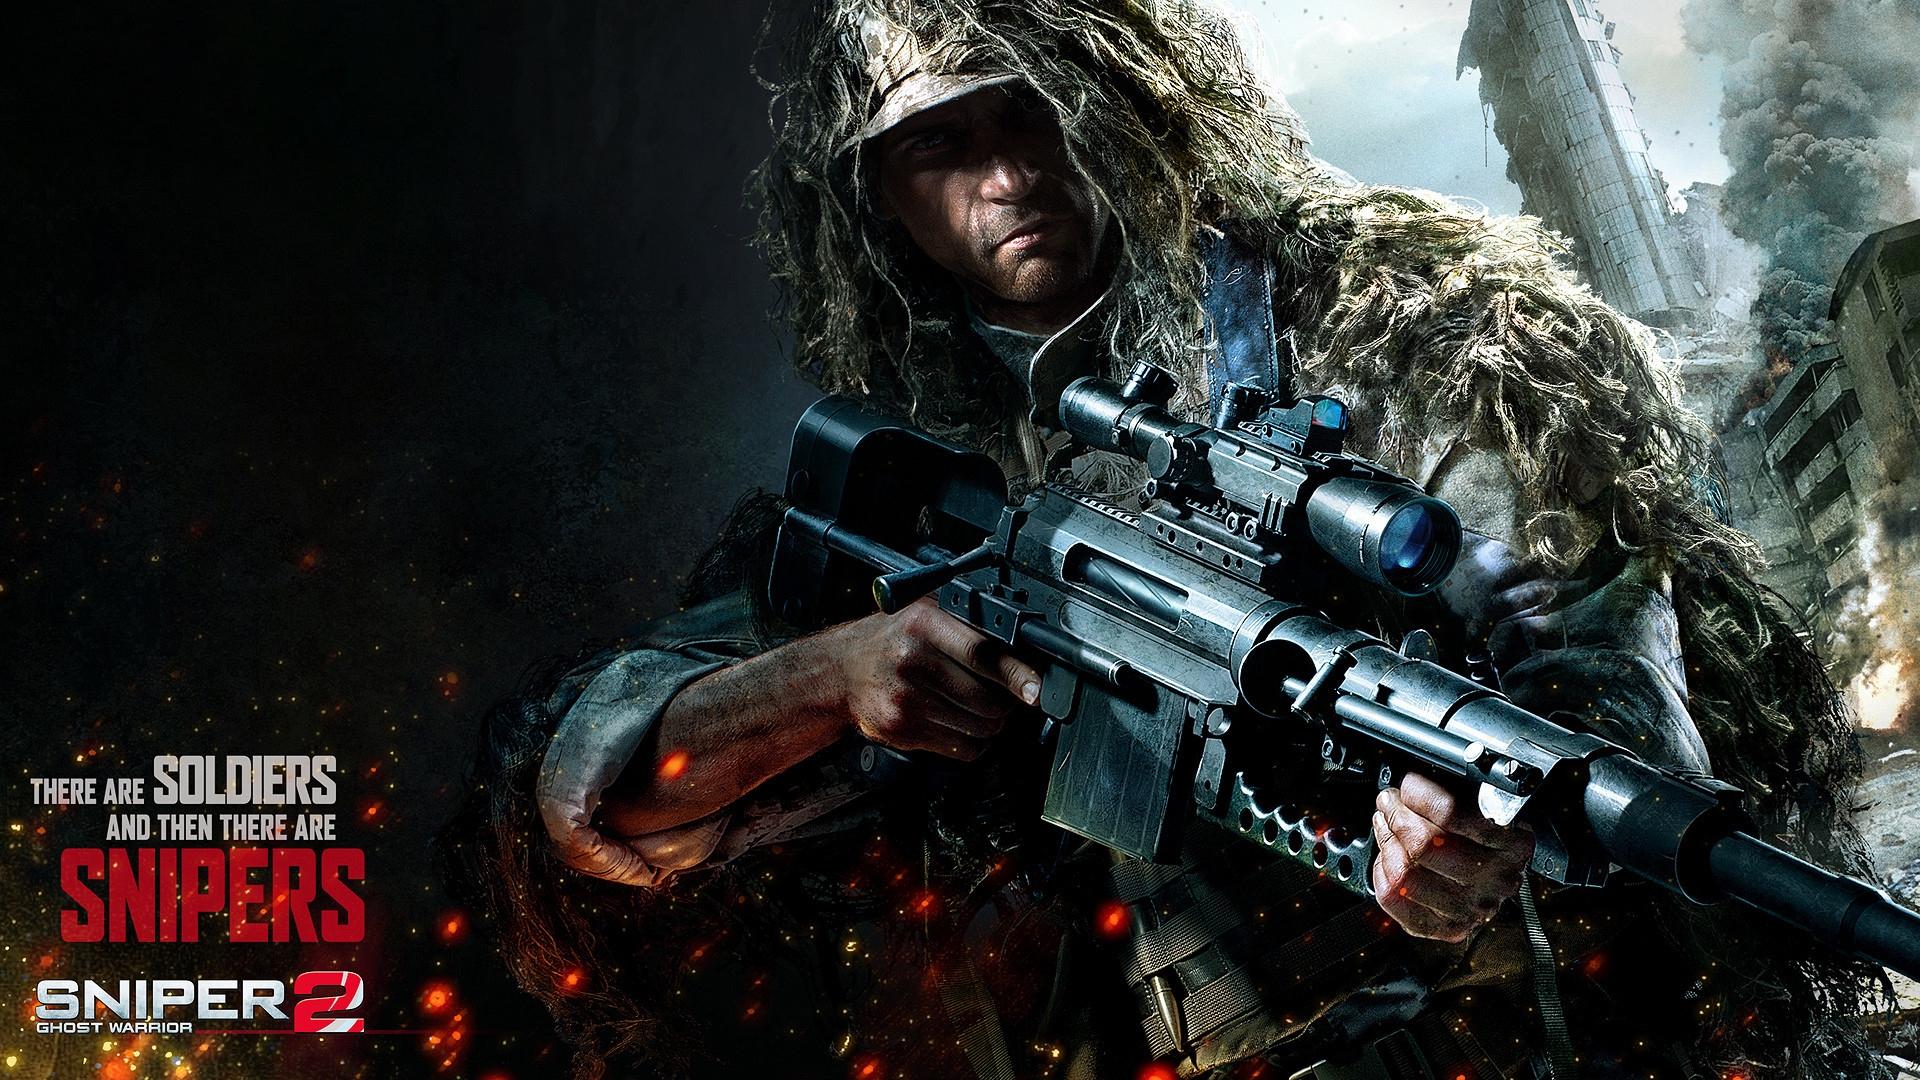 Sniper 2 Ghost Warrior Game Wallpaper 1920x1080 HD Wallpaper Games 1920x1080